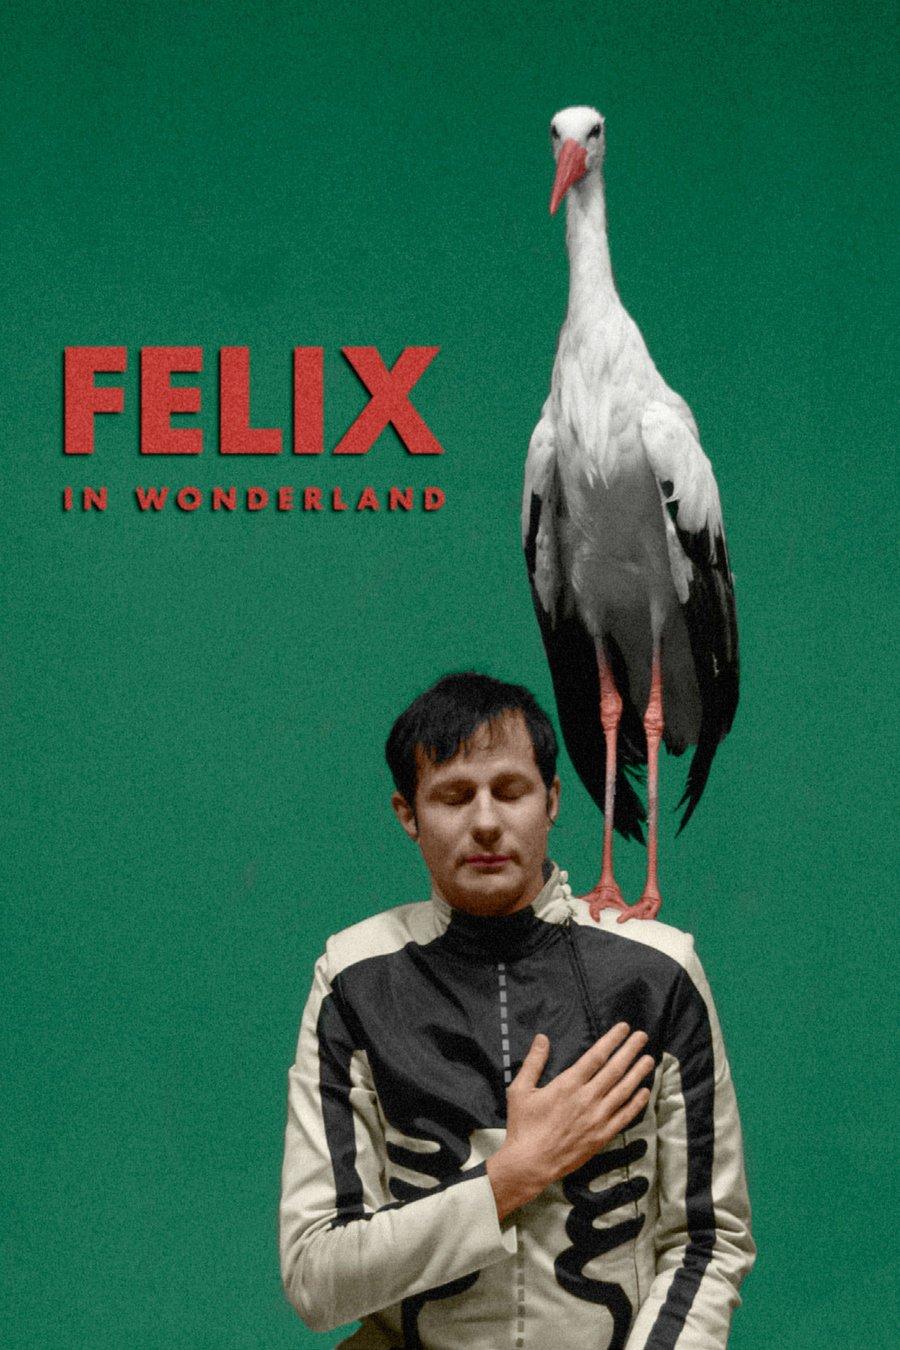 Felix in Wonderland